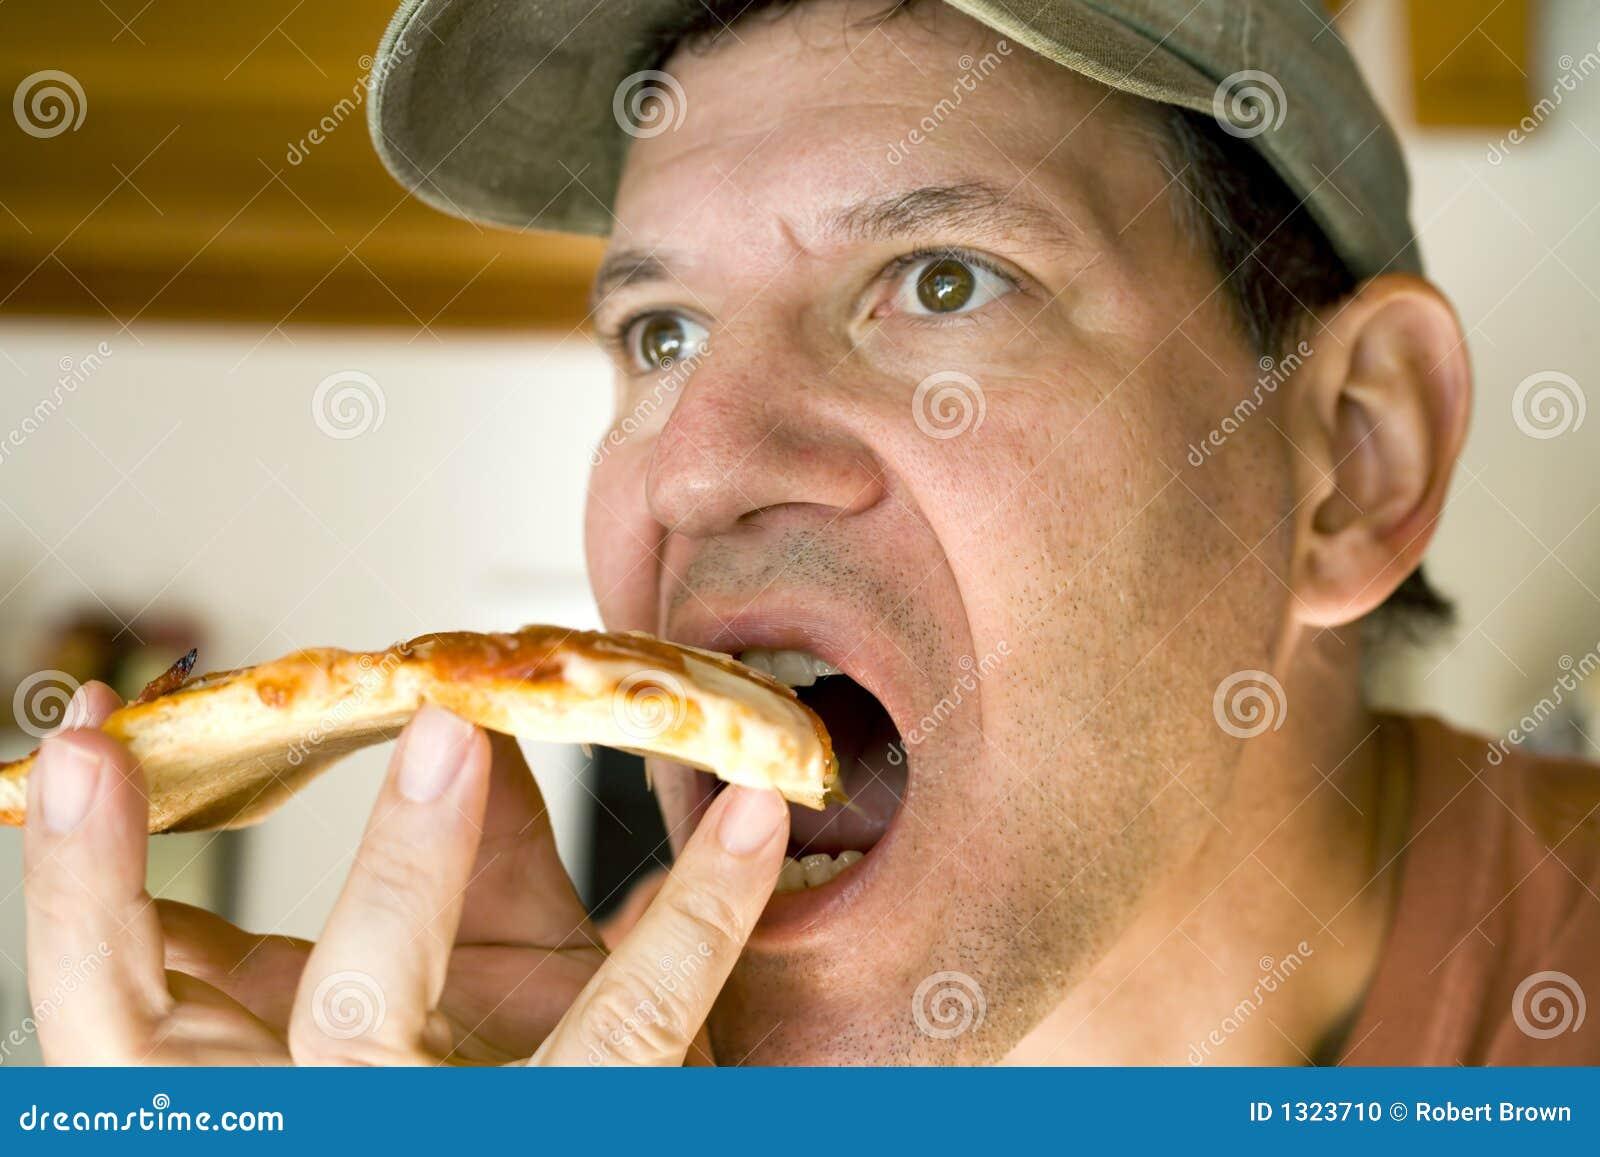 https://thumbs.dreamstime.com/z/man-eating-pepperoni-pizza-1323710.jpg